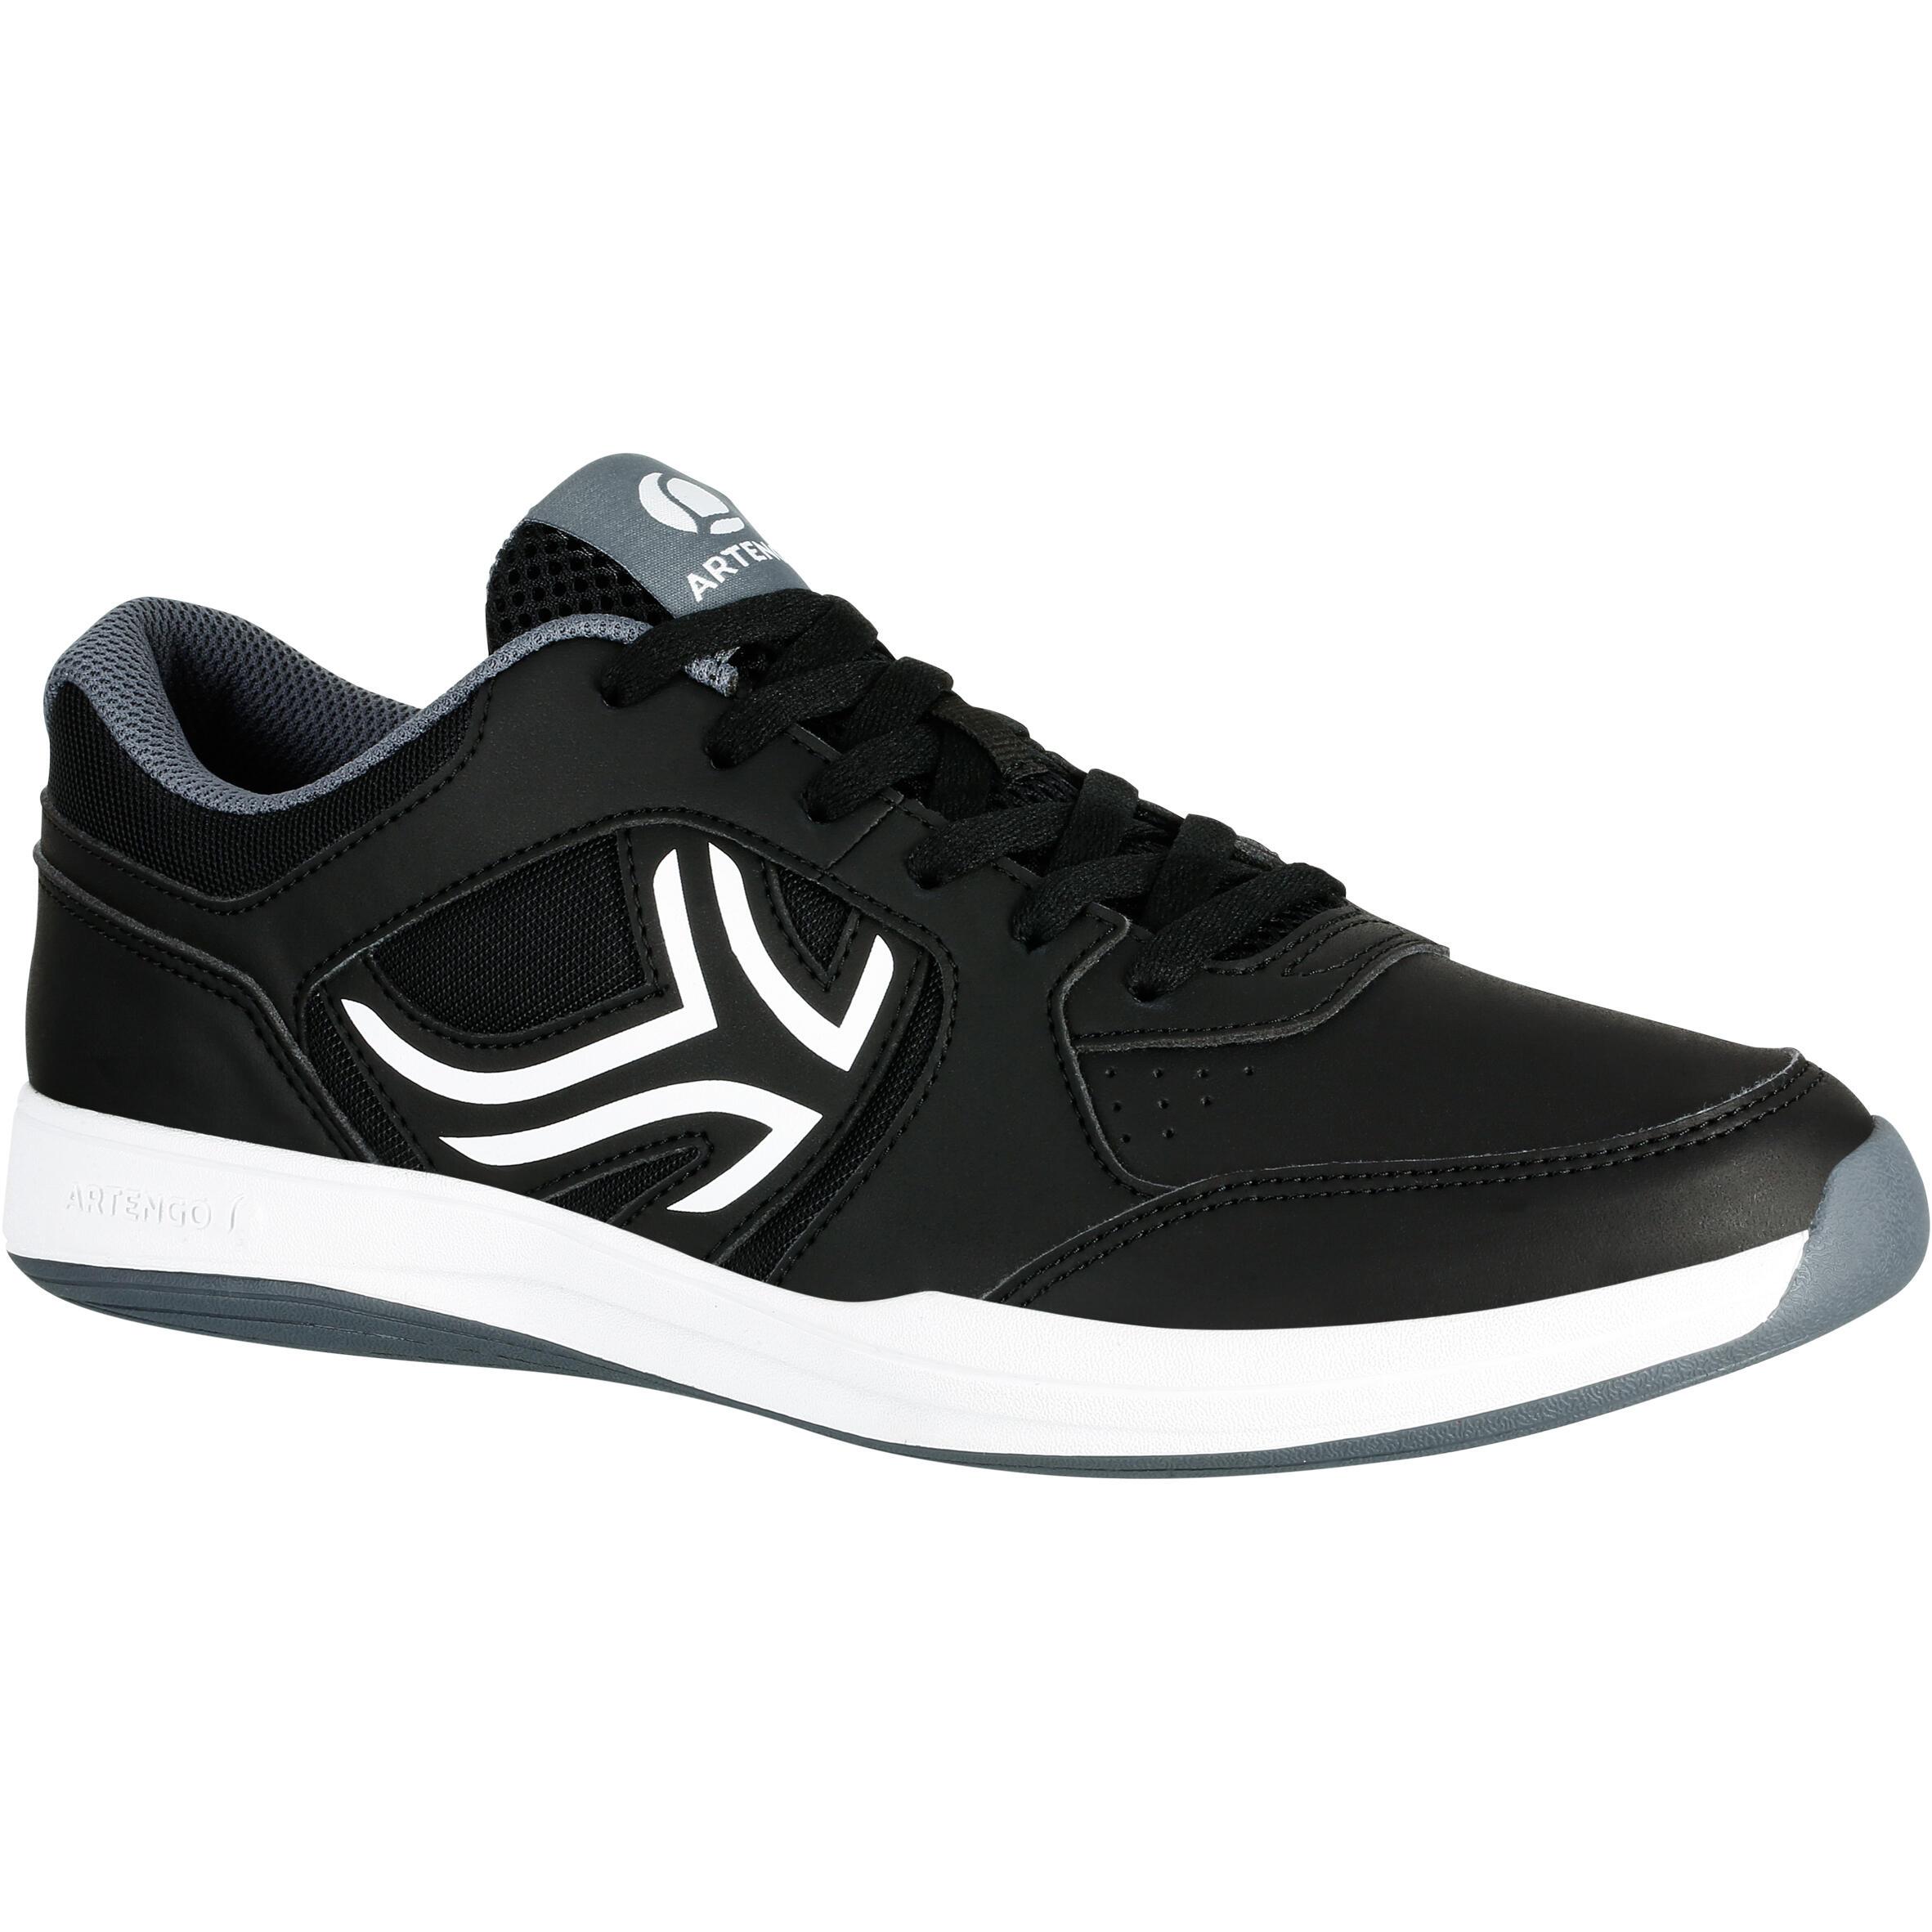 Tennisschuhe TS130 Multicourt Herren schwarz | Schuhe > Sportschuhe > Tennisschuhe | Schwarz | Artengo